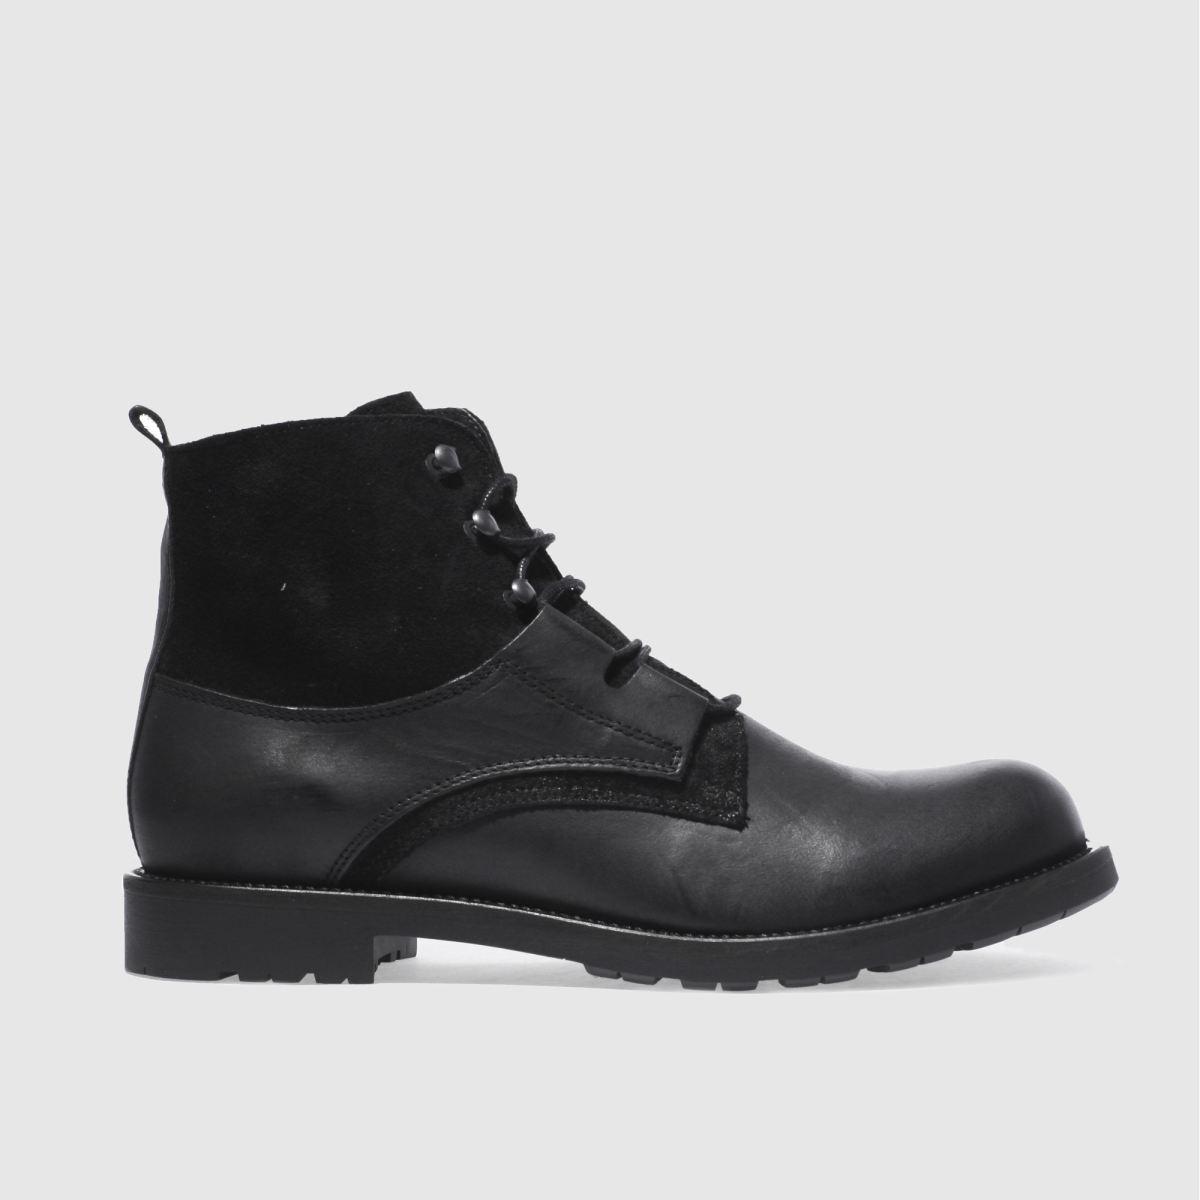 schuh black duke ghilli boots